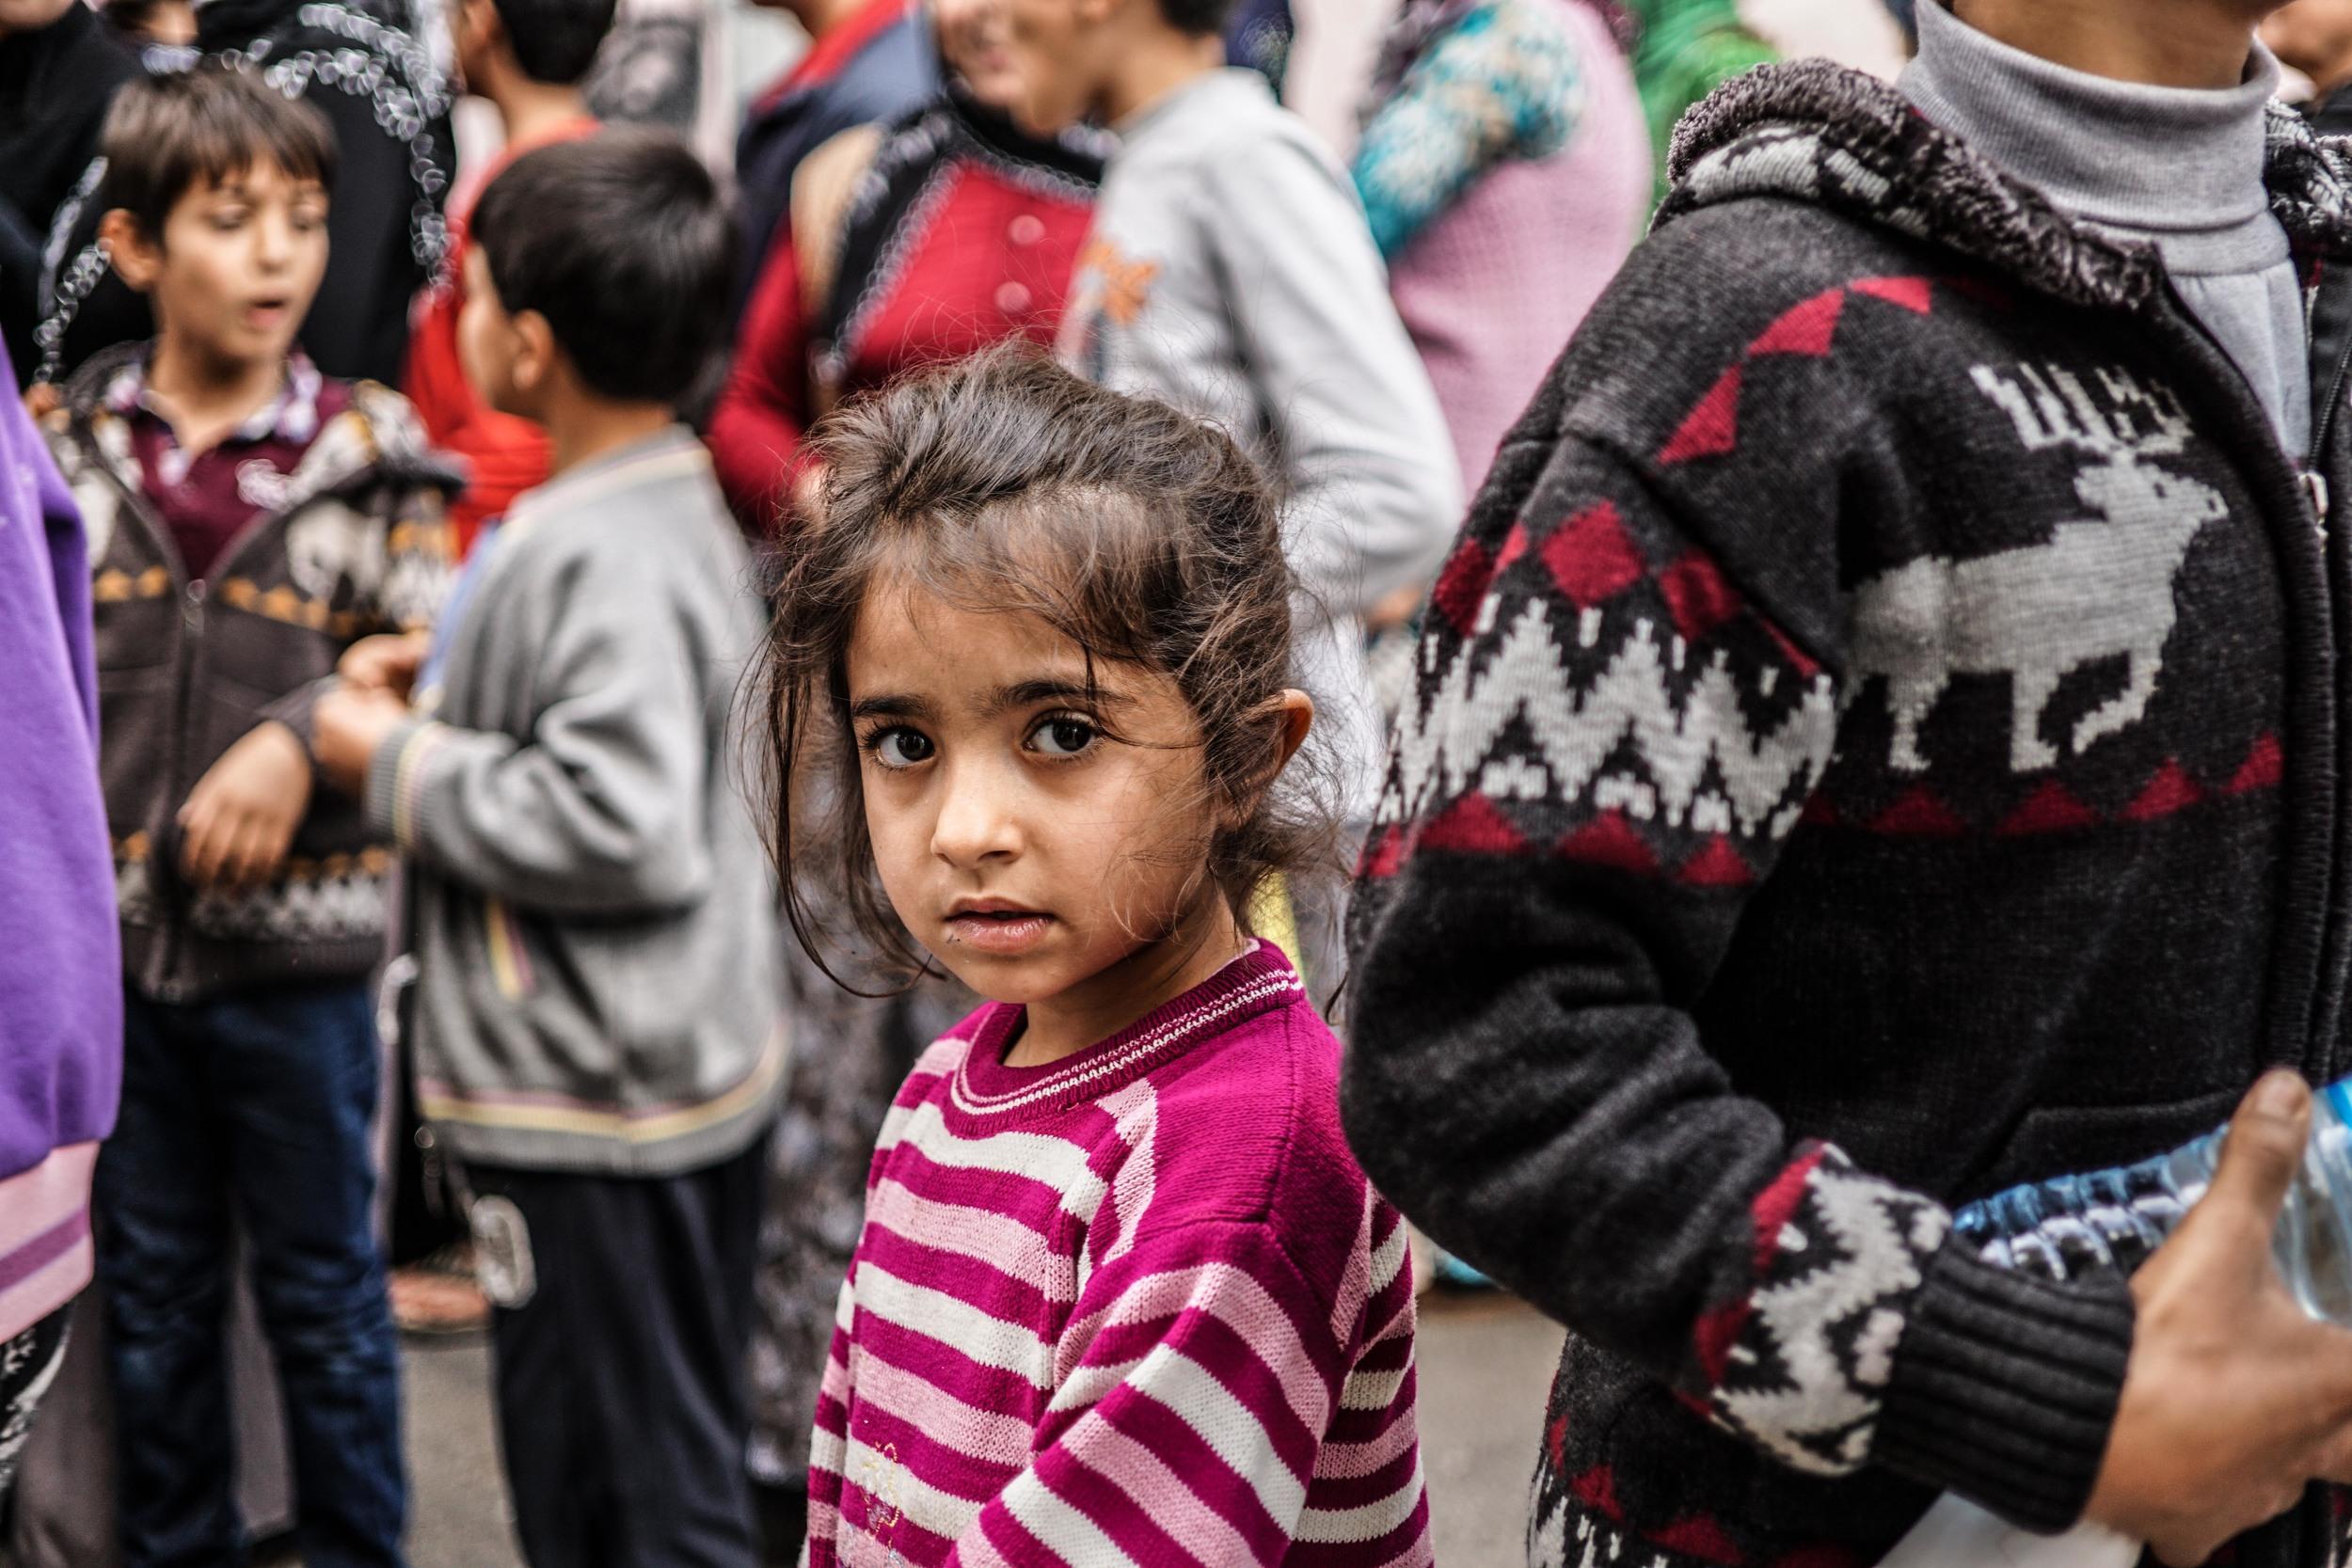 Syrian Refugee Crisis Izmir November 2015 4.jpg